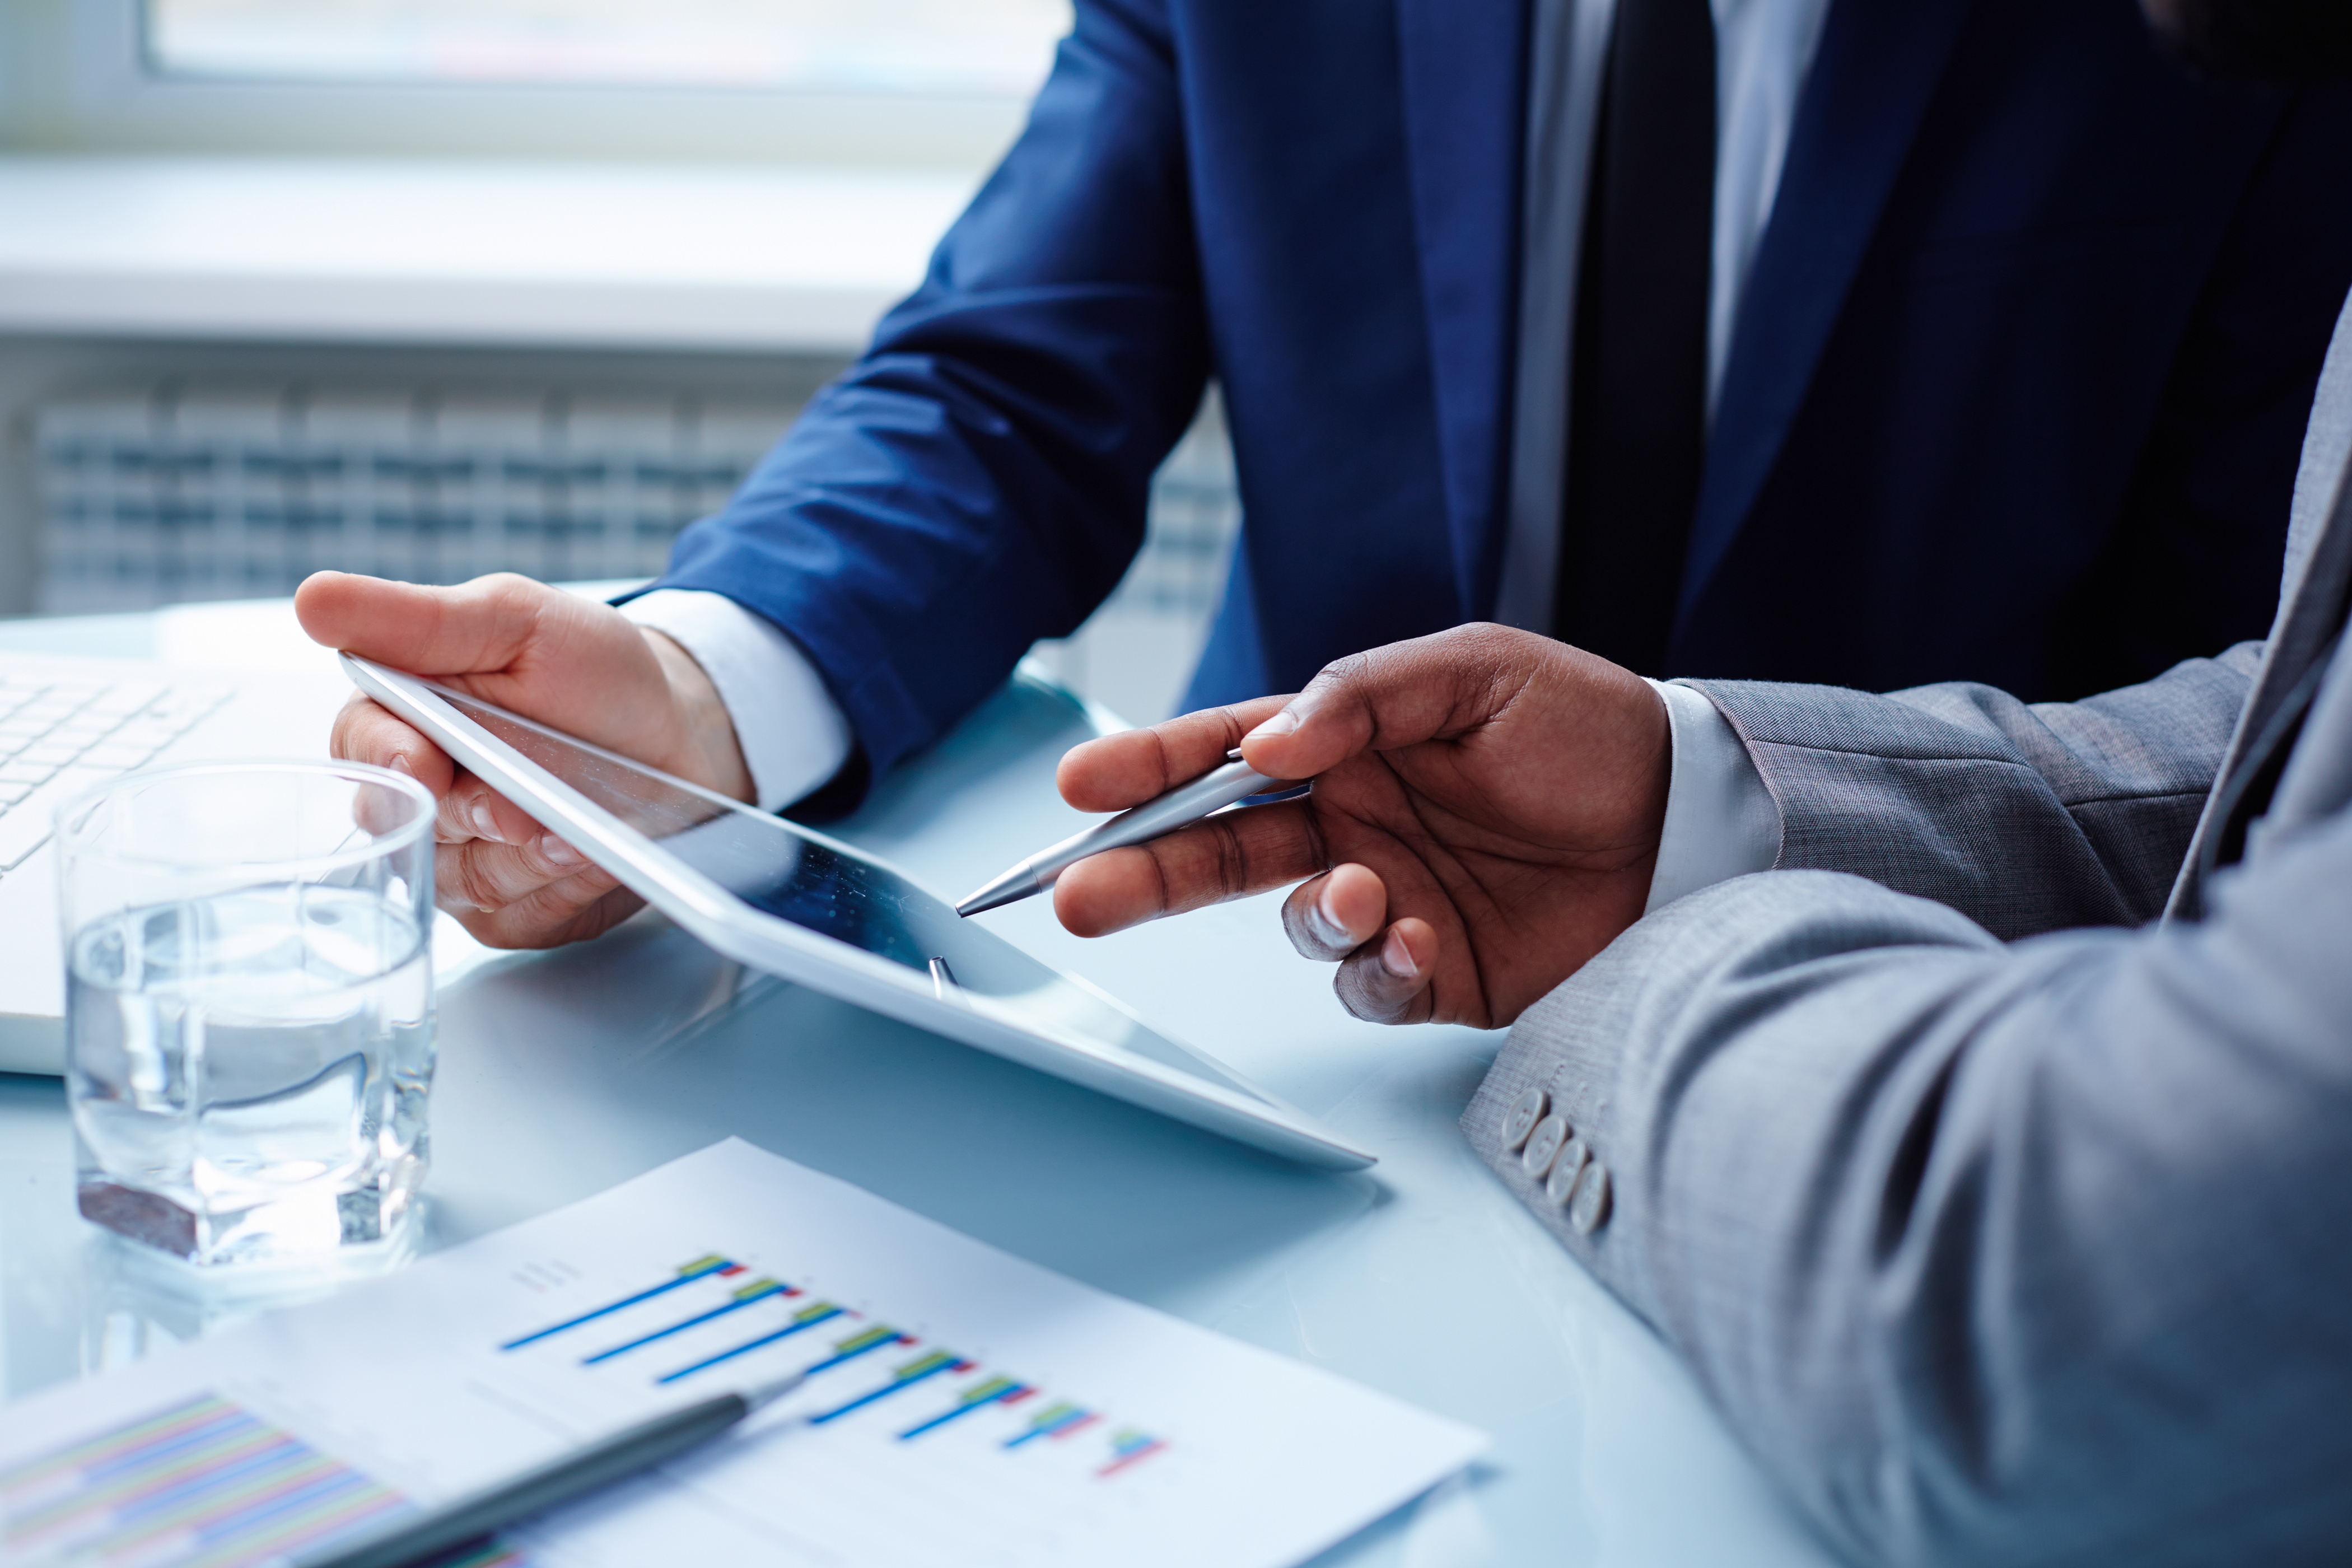 How The Google Antitrust Lawsuit Could Impact Your Business